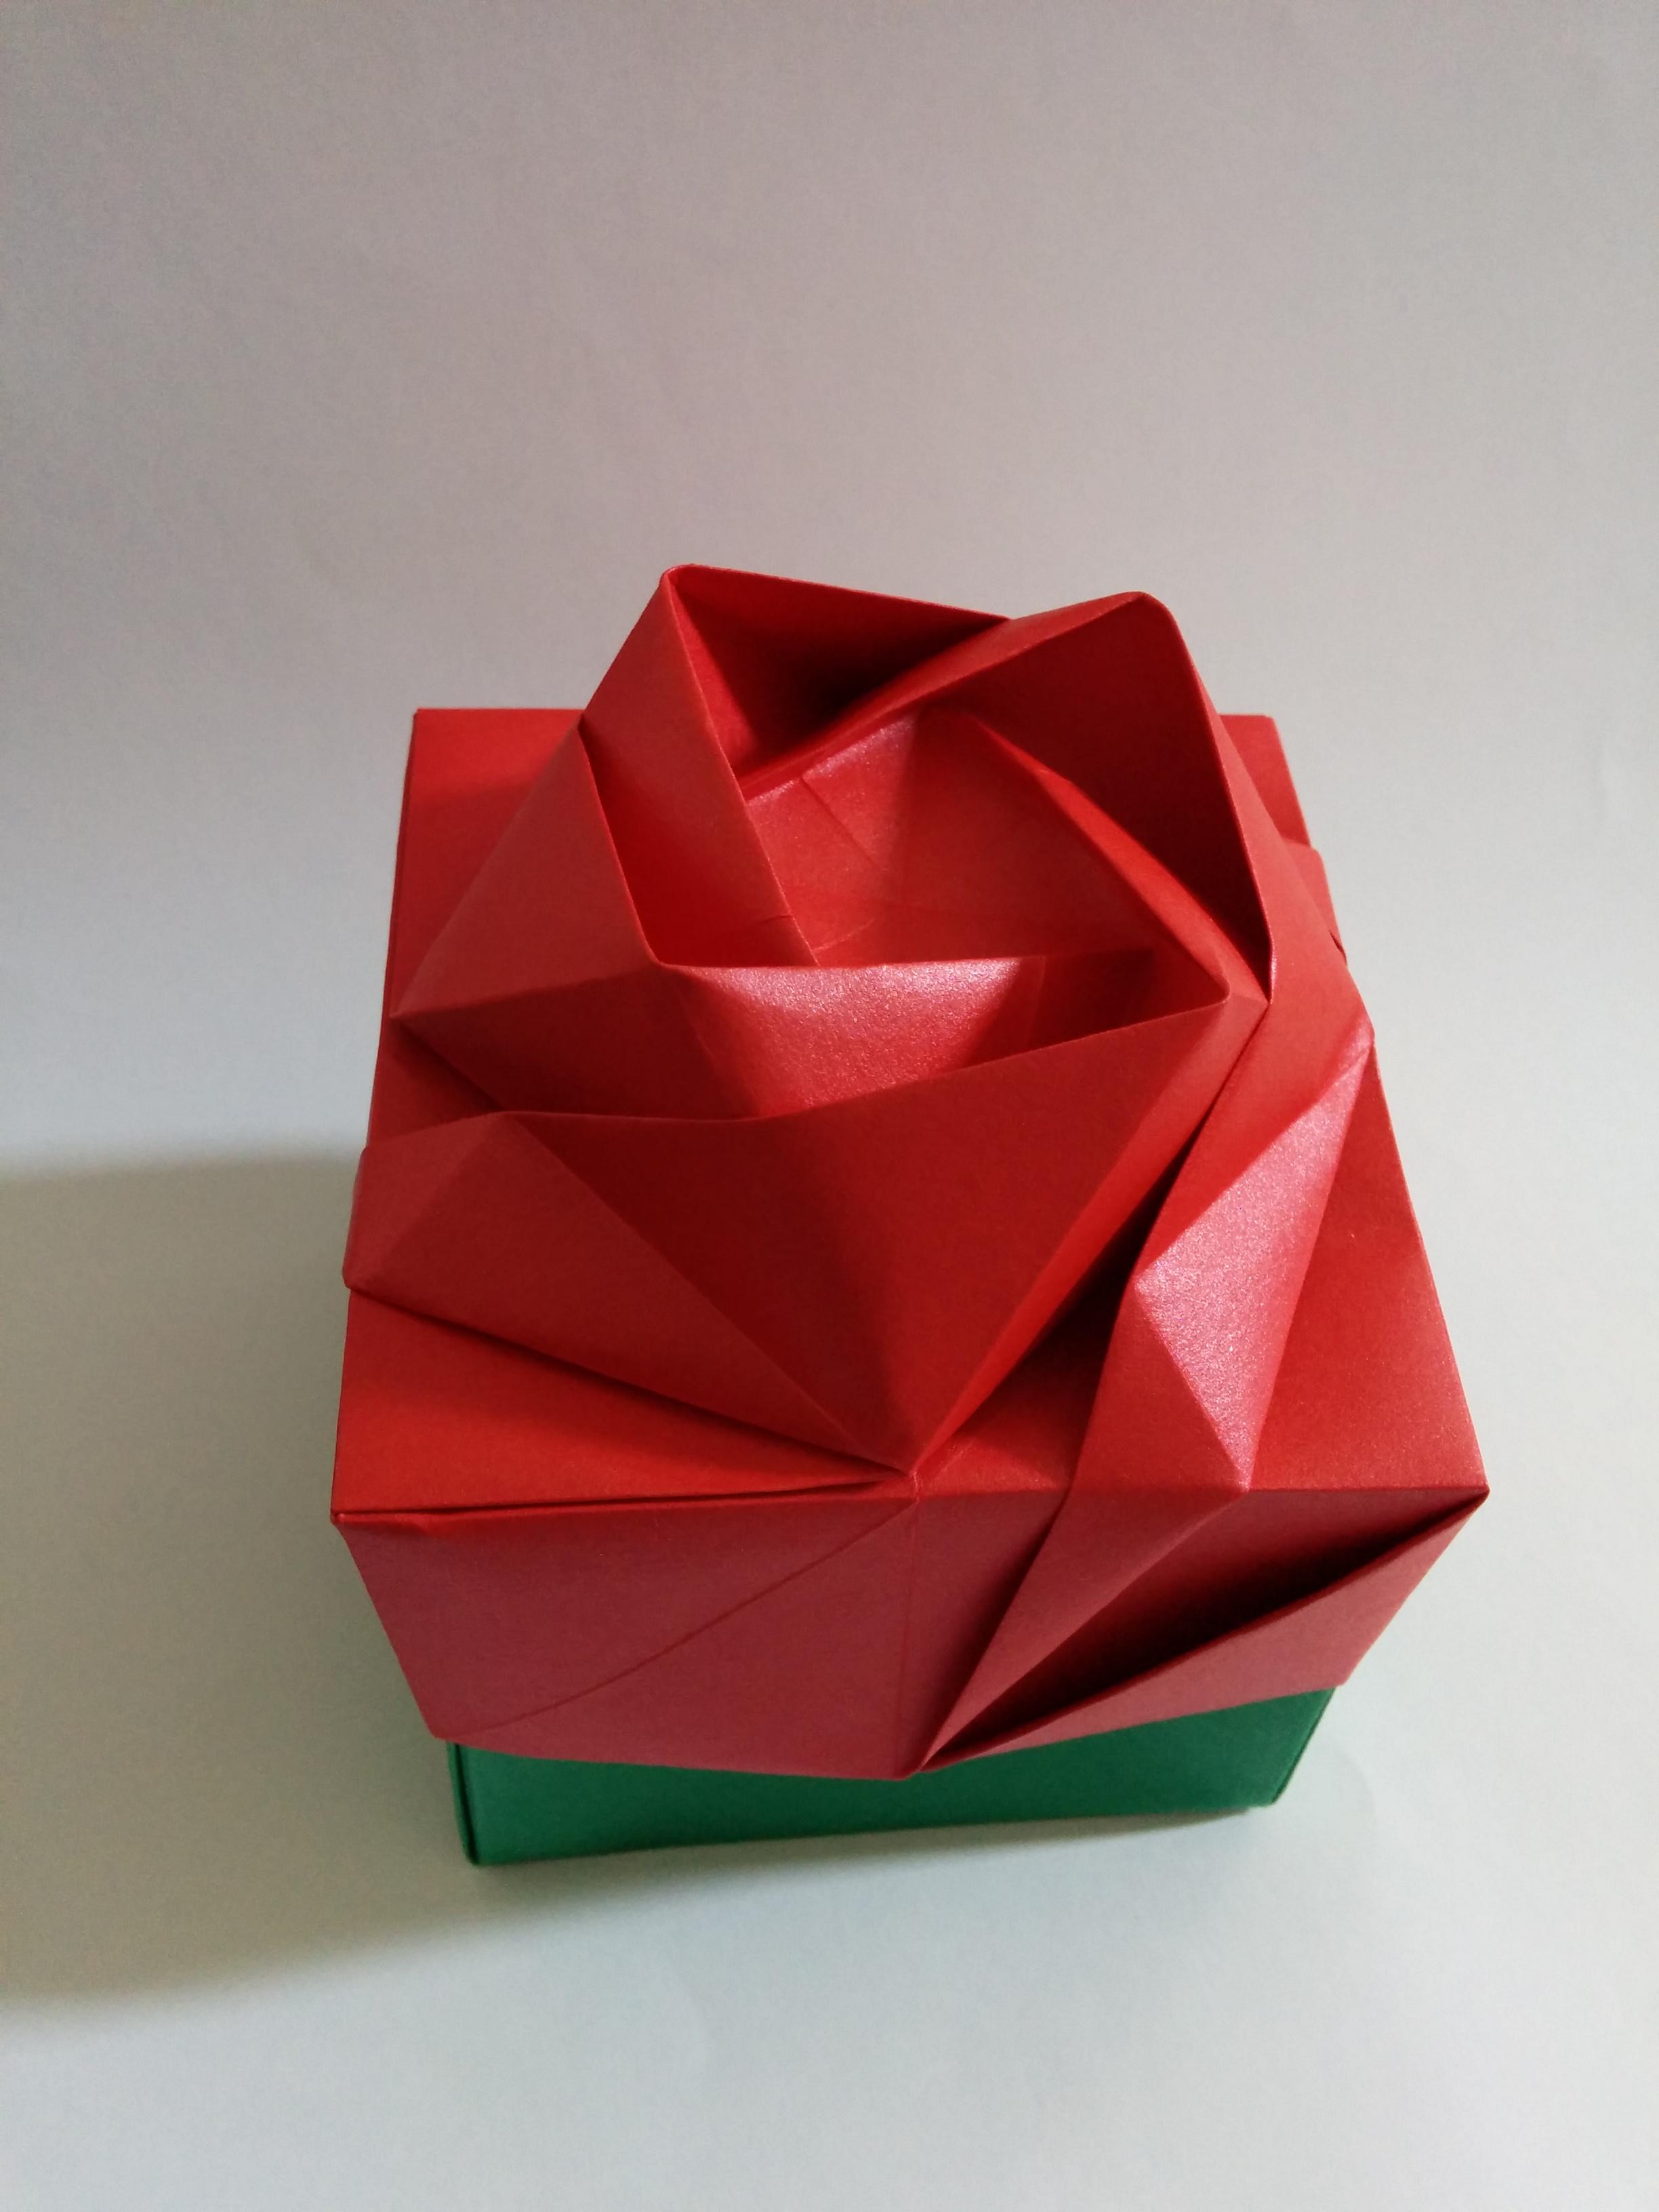 Caixa Rosa Origami No Elo7 Origami By Tchami 4ba12f